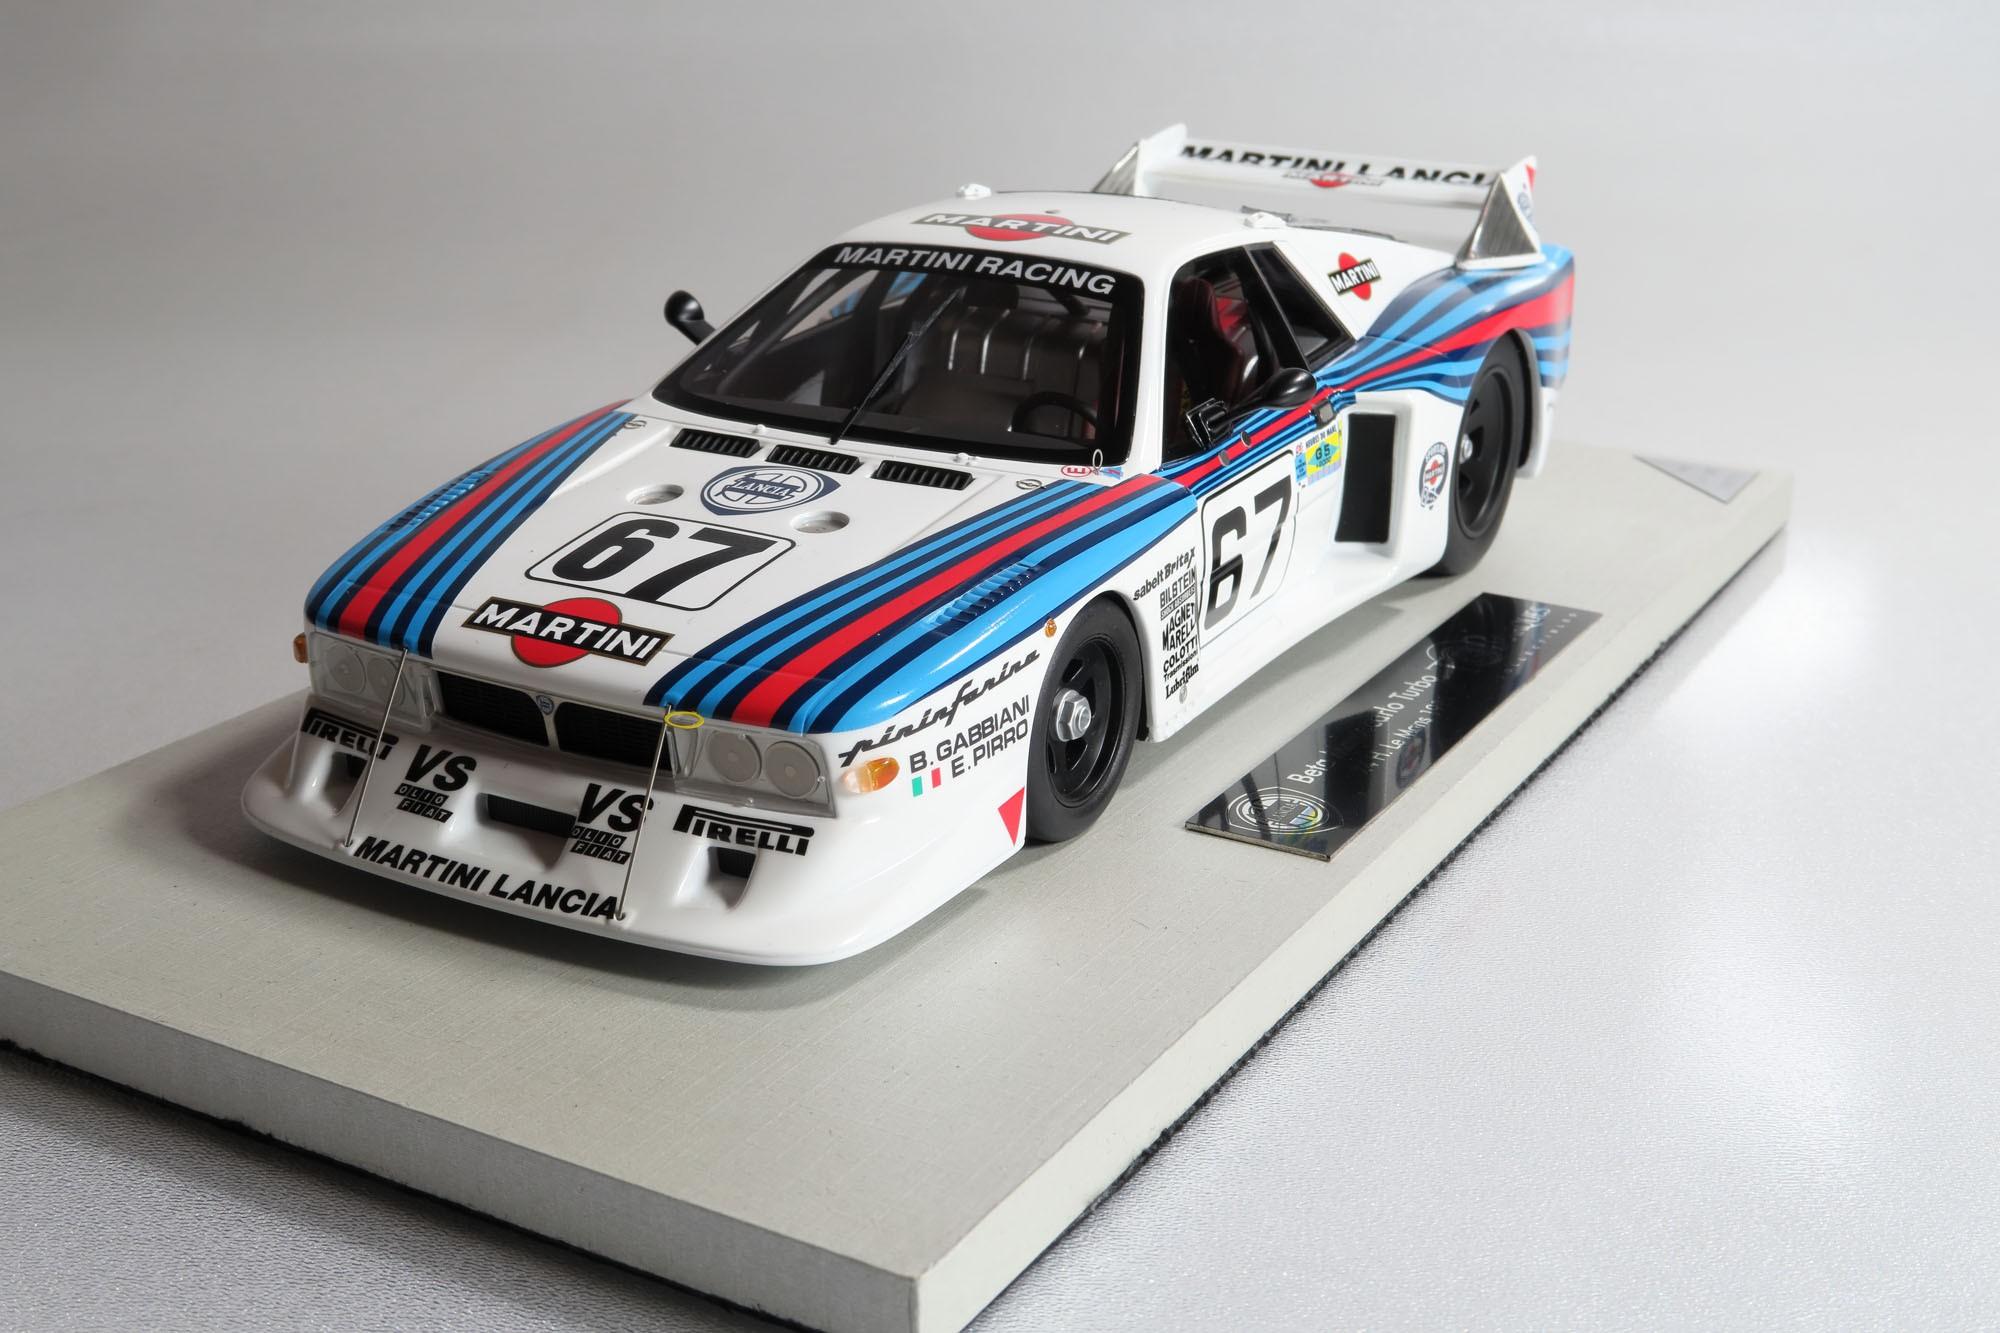 top marques collectibles lancia beta montecarlo 24h le mans 1981 67 1 18 racing top21c. Black Bedroom Furniture Sets. Home Design Ideas